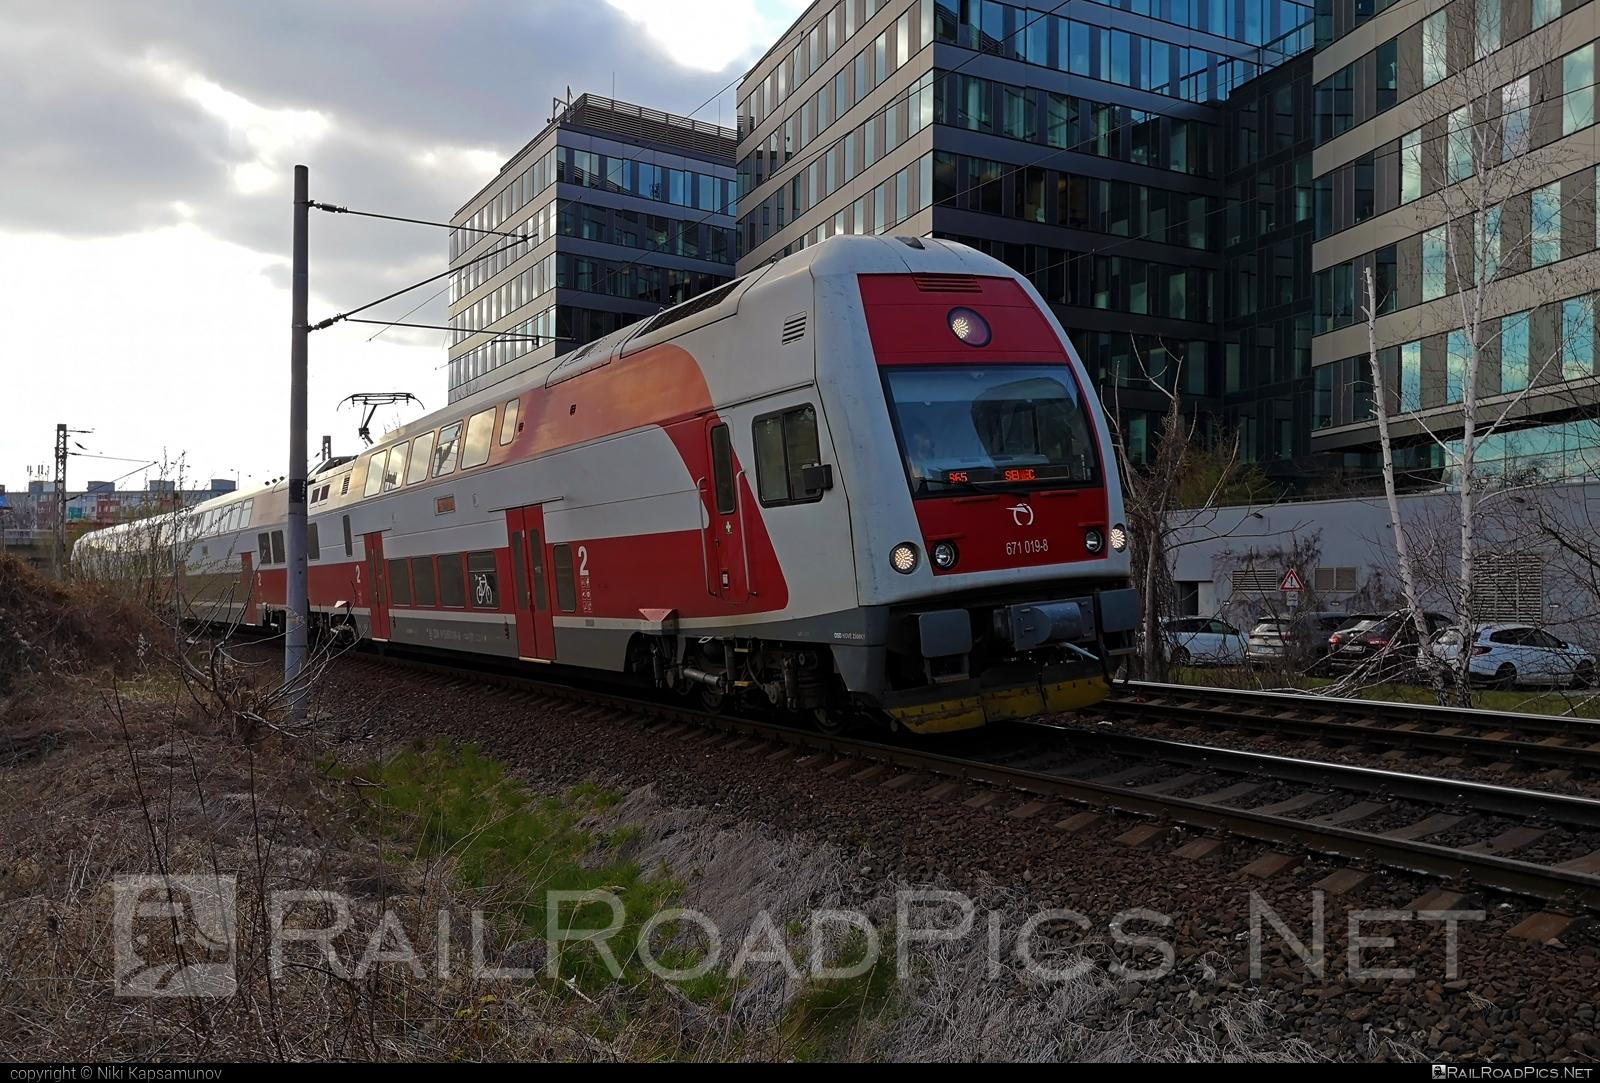 Škoda 4Ev - 671 019-8 operated by Železničná Spoločnost' Slovensko, a.s. #ZeleznicnaSpolocnostSlovensko #emu671 #skoda #skoda4ev #skodaclass671 #zssk